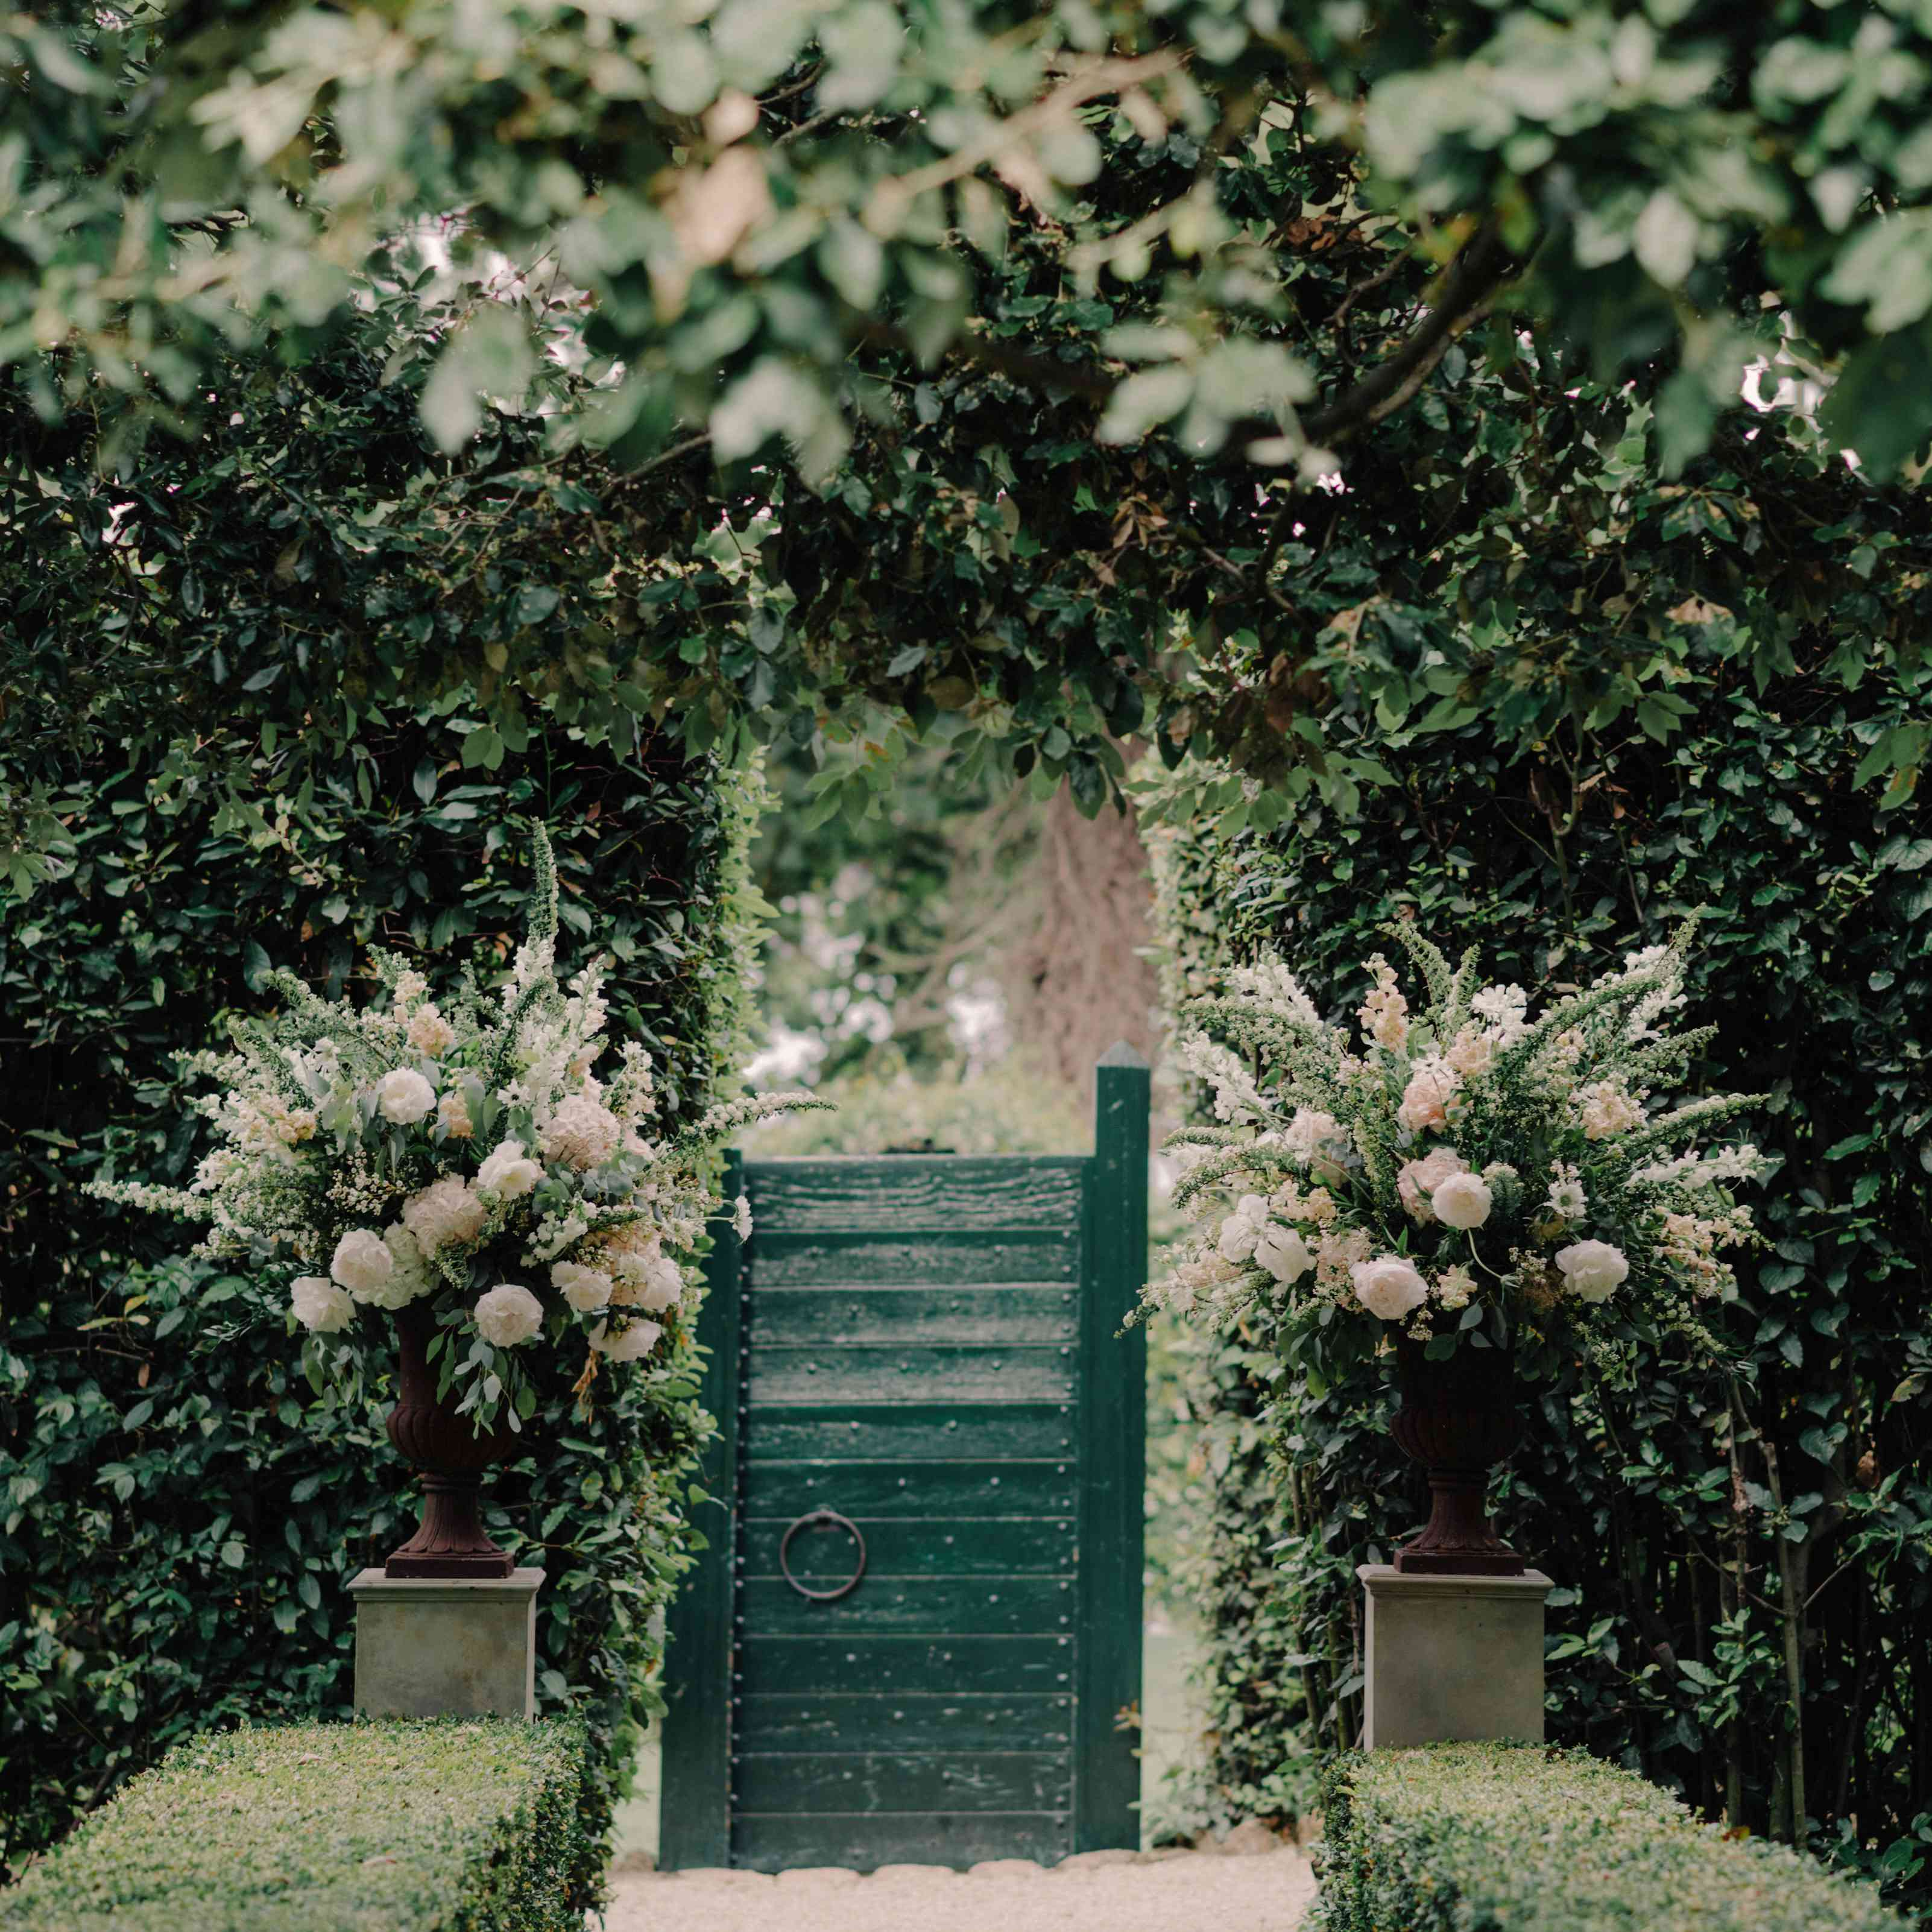 Garden-Lined Aisle